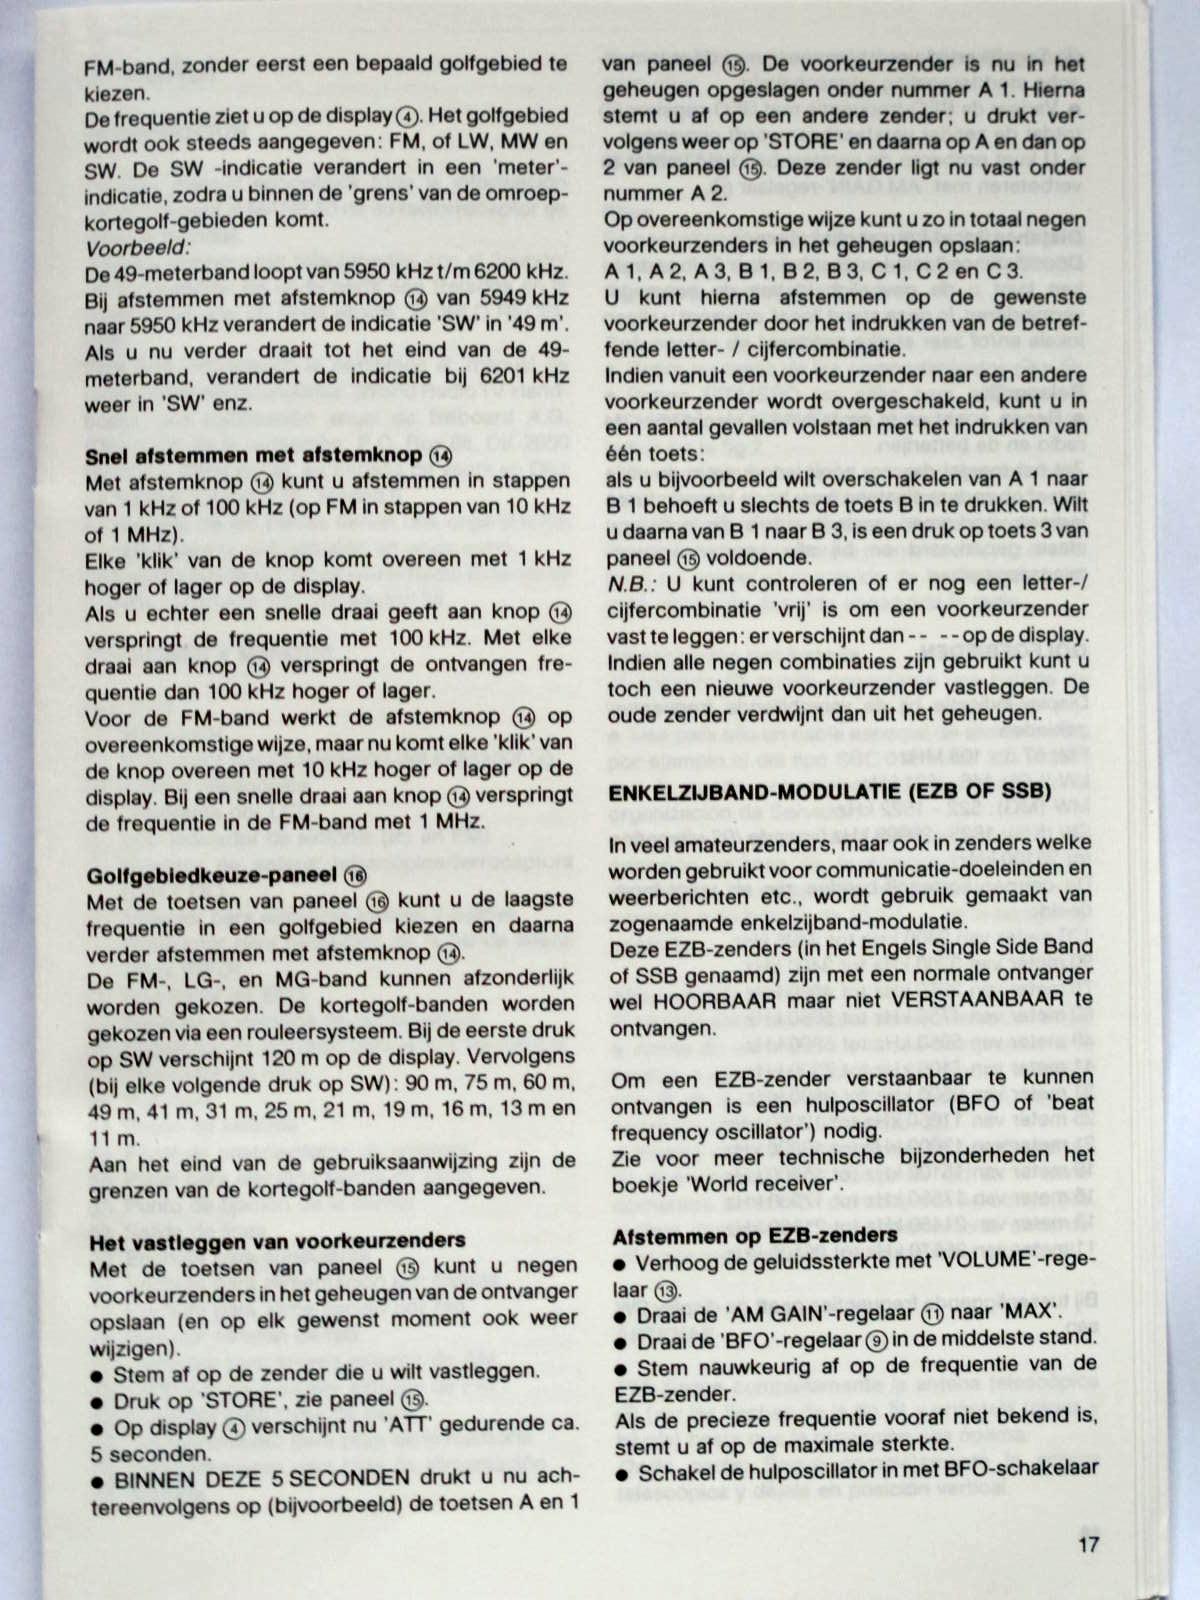 Gerard's Philips D2935/00